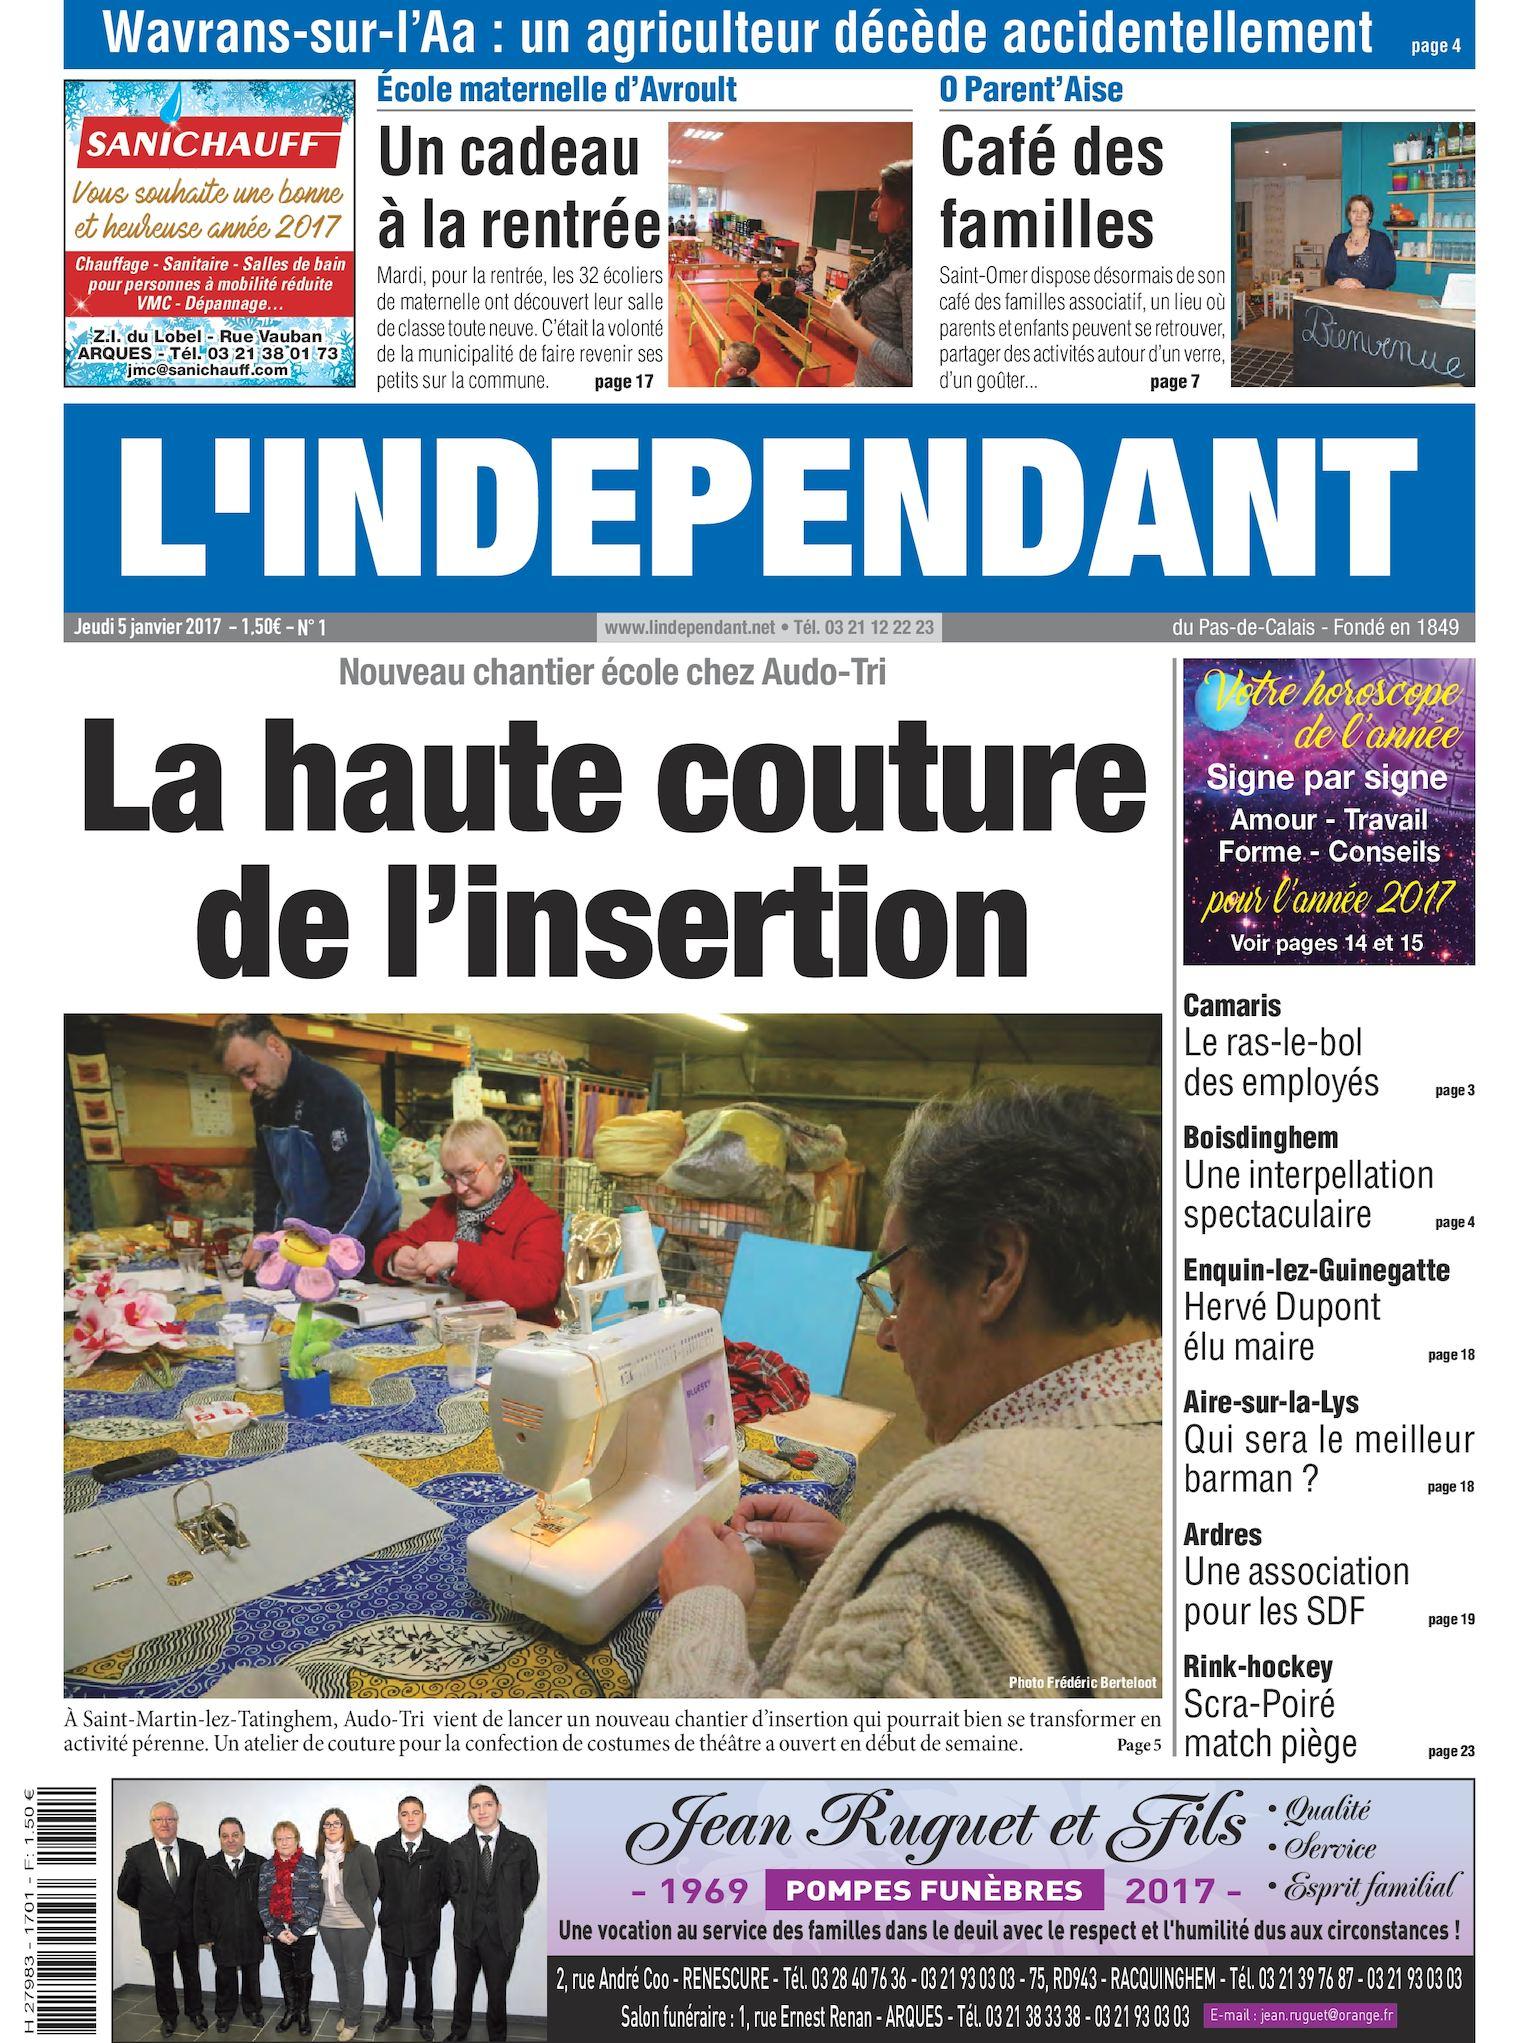 Calaméo L indépendant Semaine 01 2017